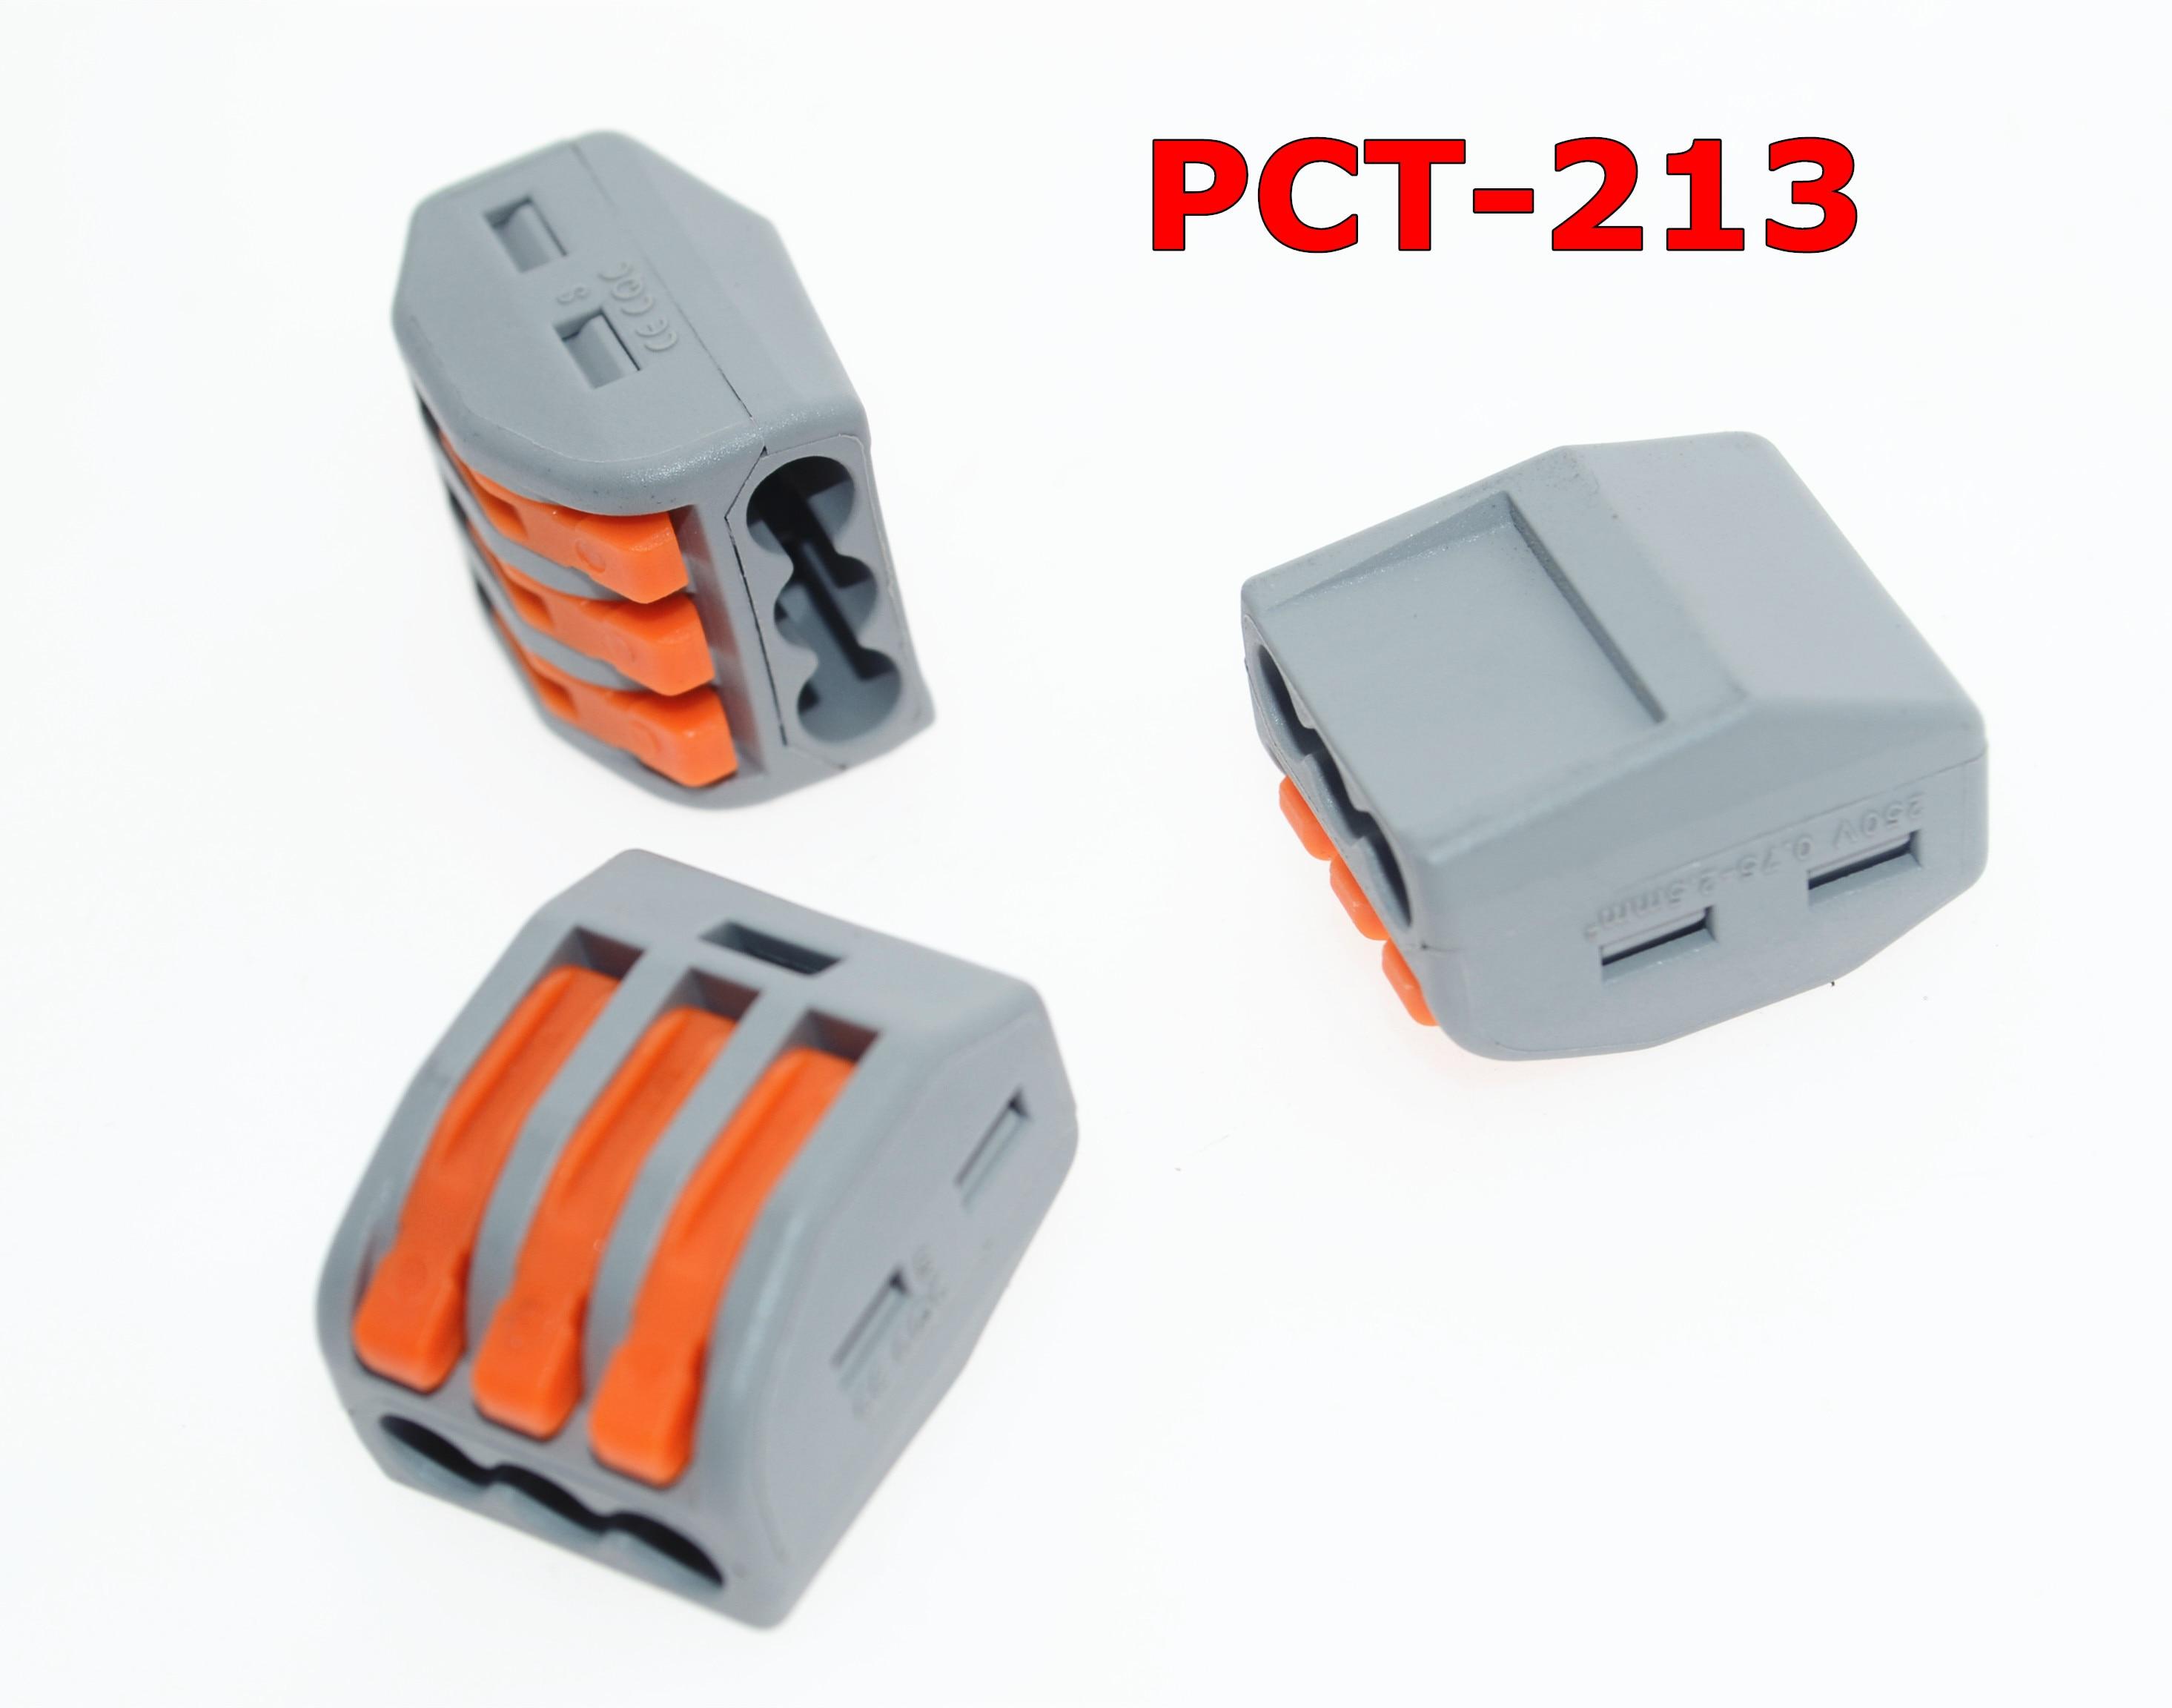 wago 222 413 connector 10pcs pct 213 3p universal compact. Black Bedroom Furniture Sets. Home Design Ideas